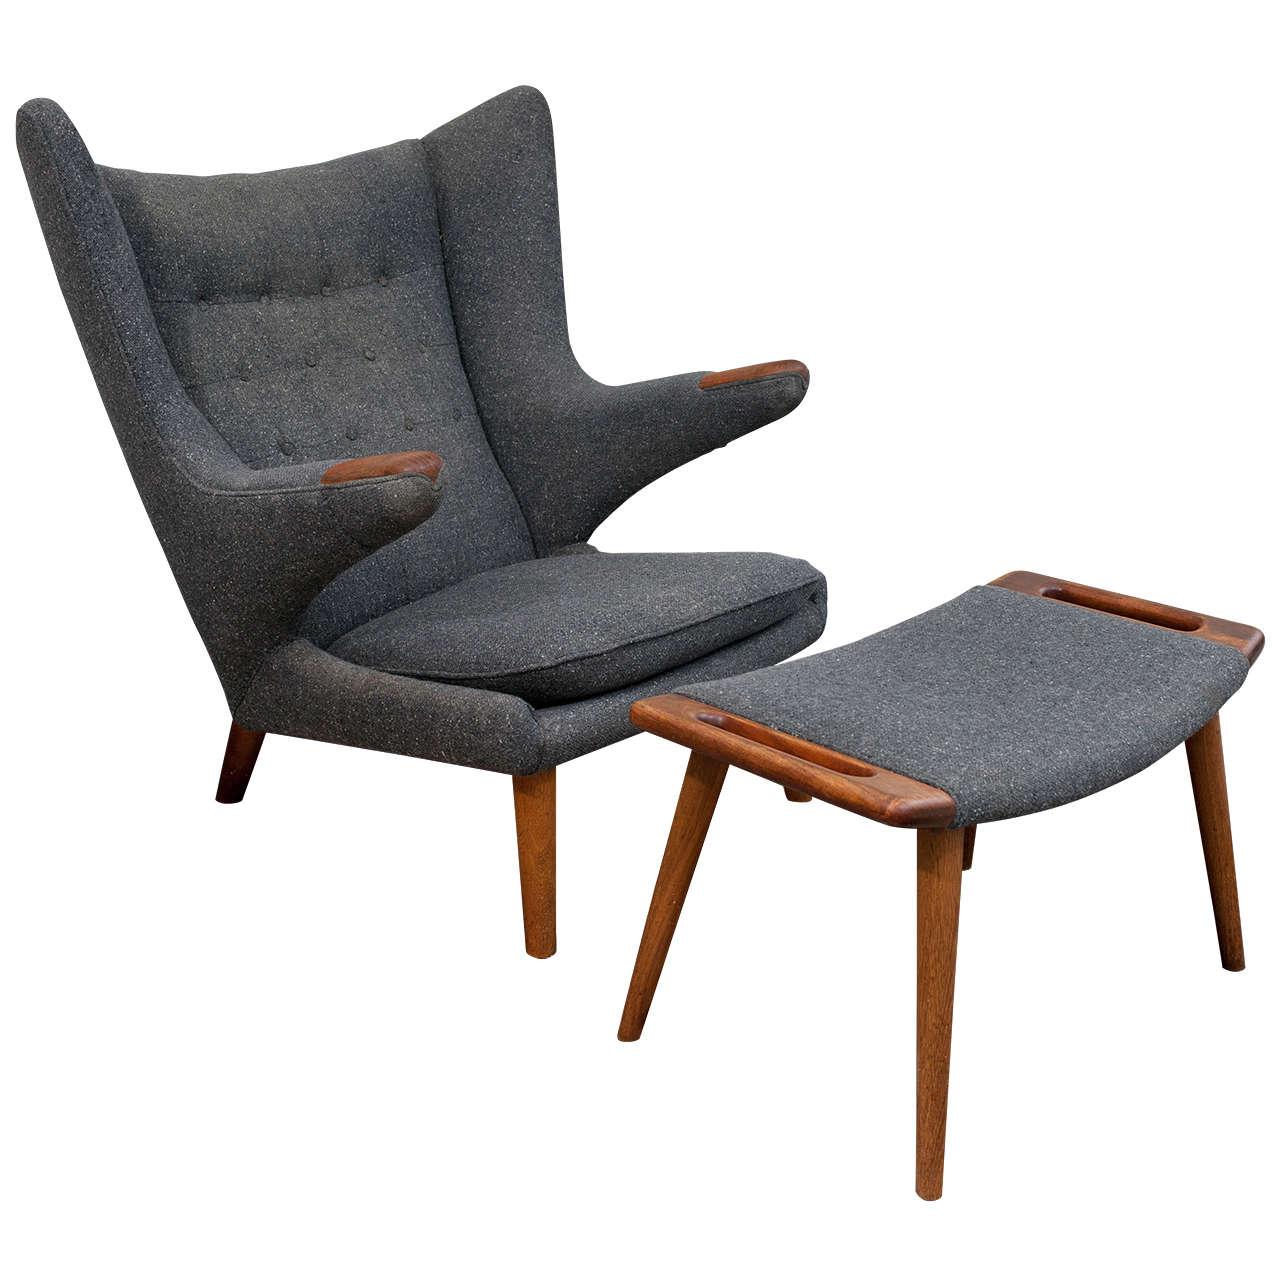 Marvelous Vintage Hans Wegner Papa Bear Chair And Ottoman At 1Stdibs Ibusinesslaw Wood Chair Design Ideas Ibusinesslaworg